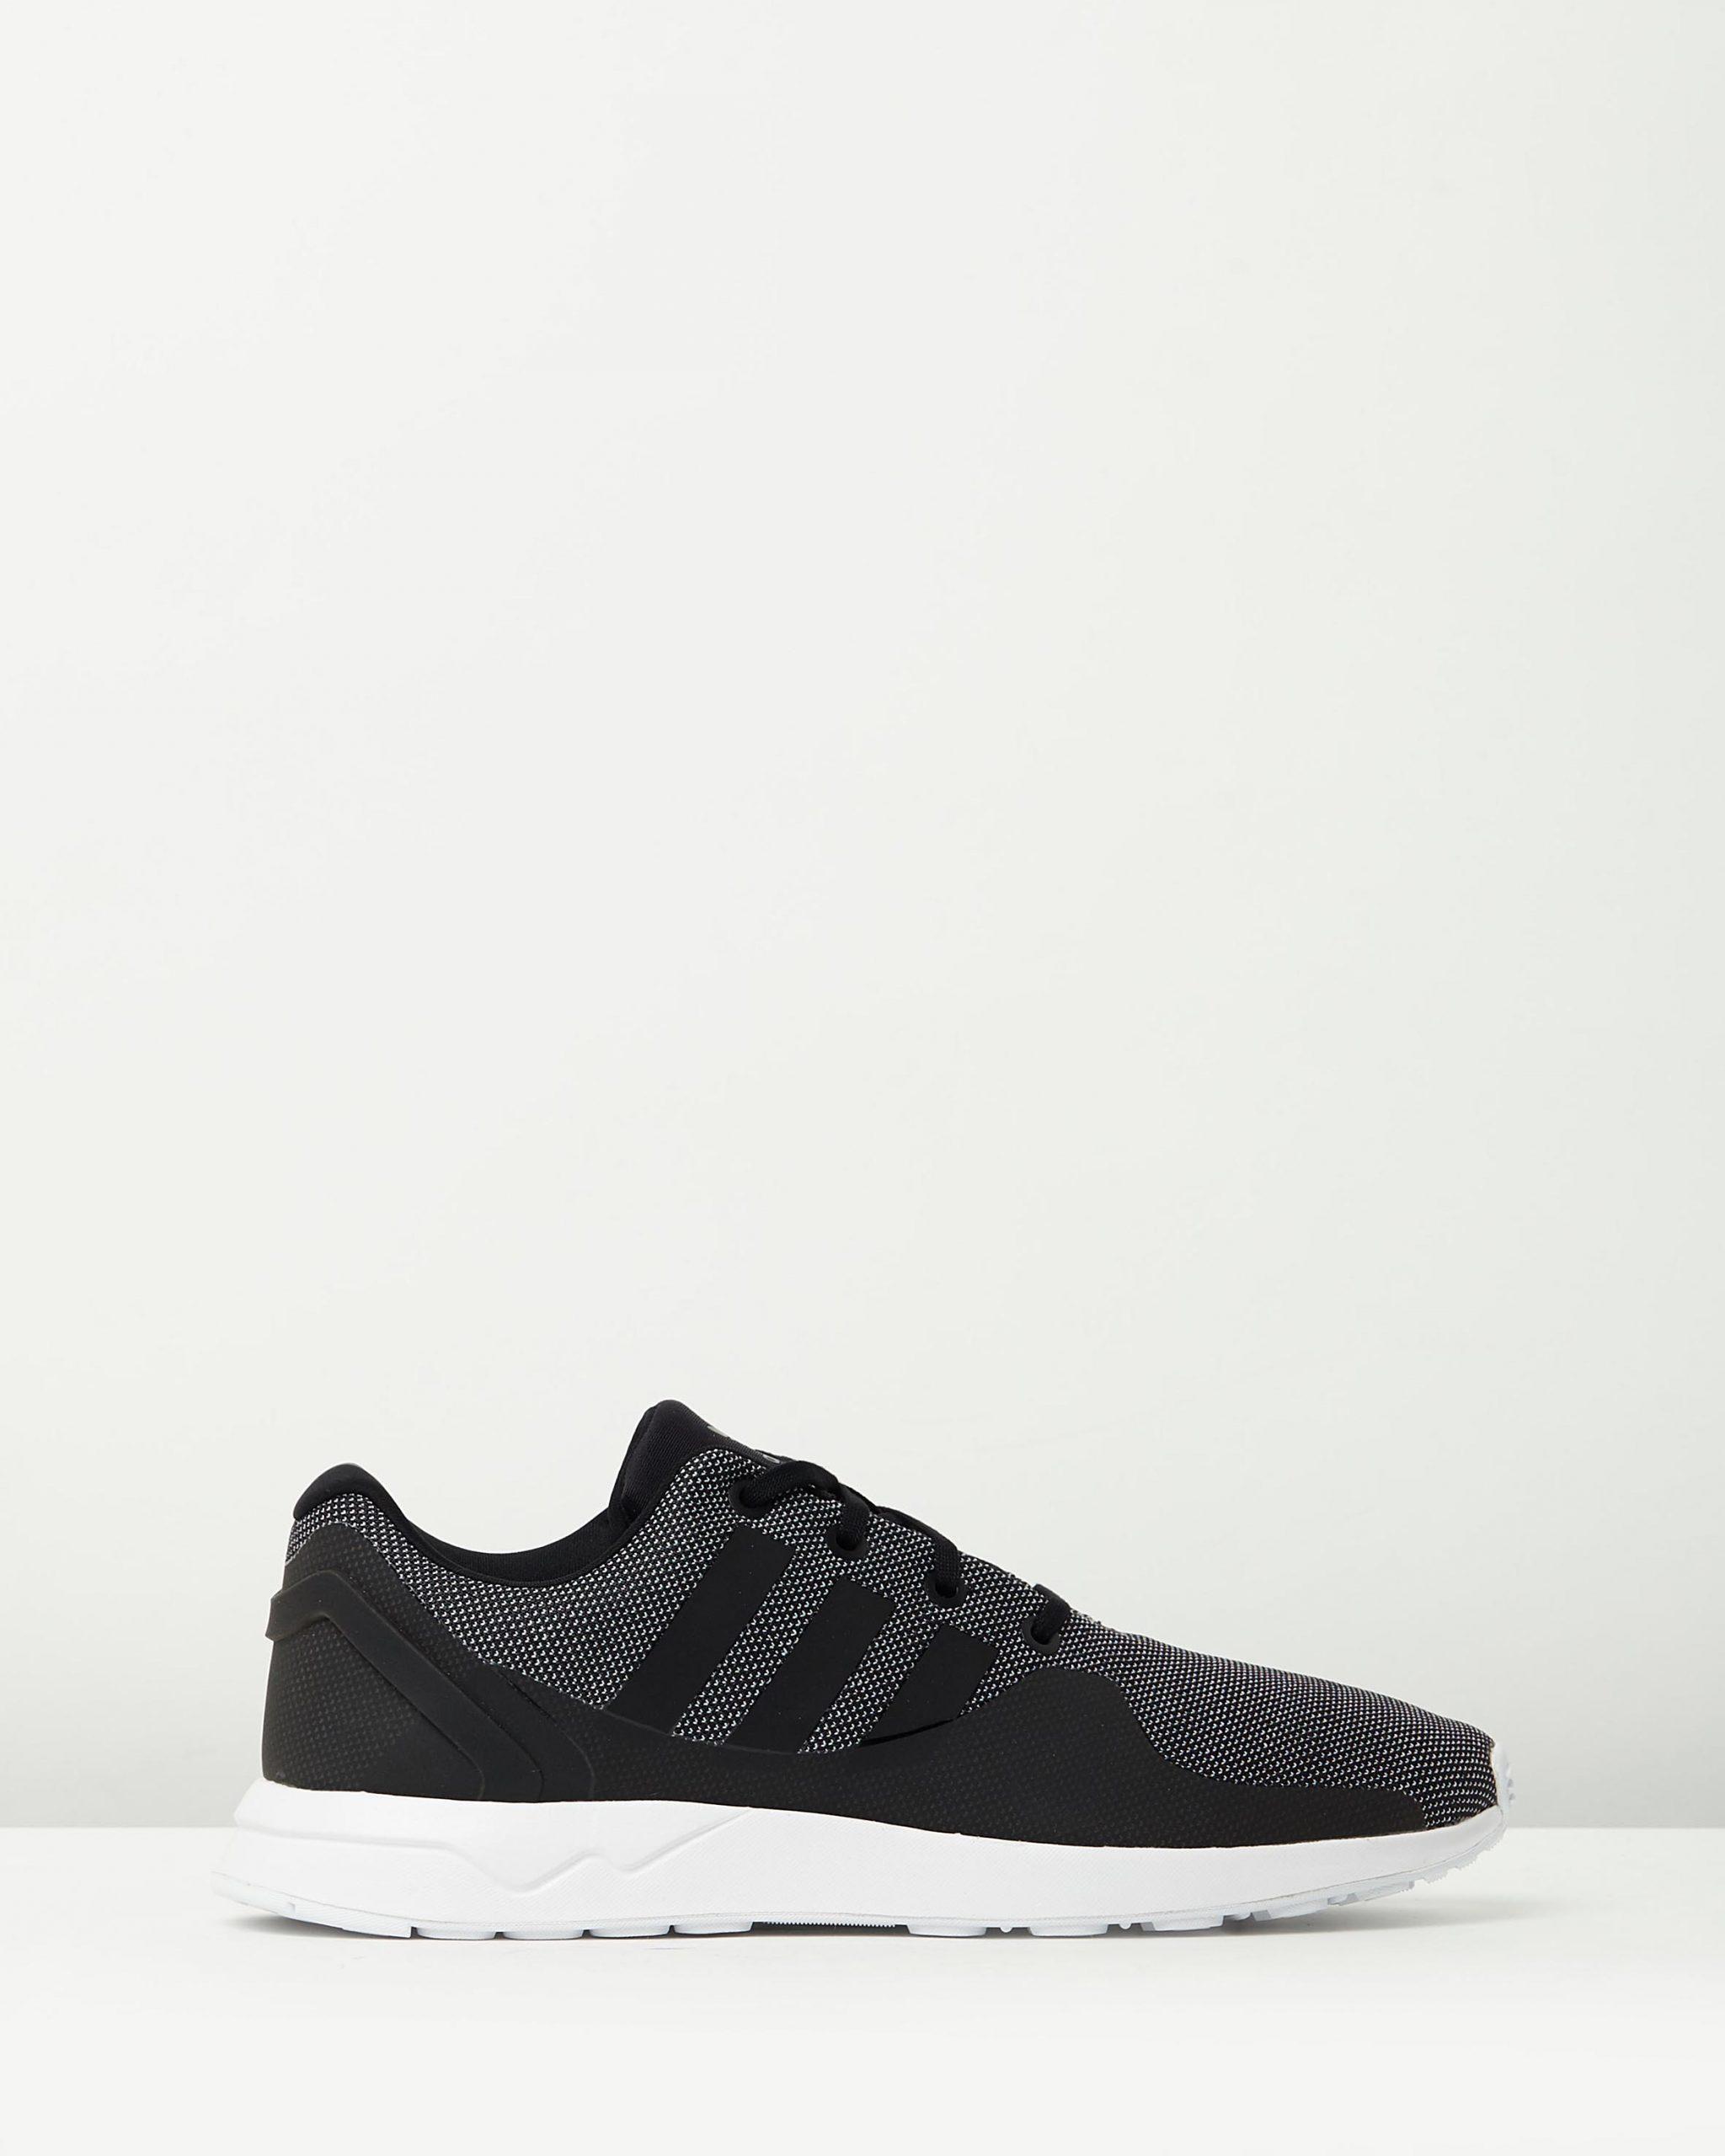 Adidas Men's ZX Flux ADV Tech Black